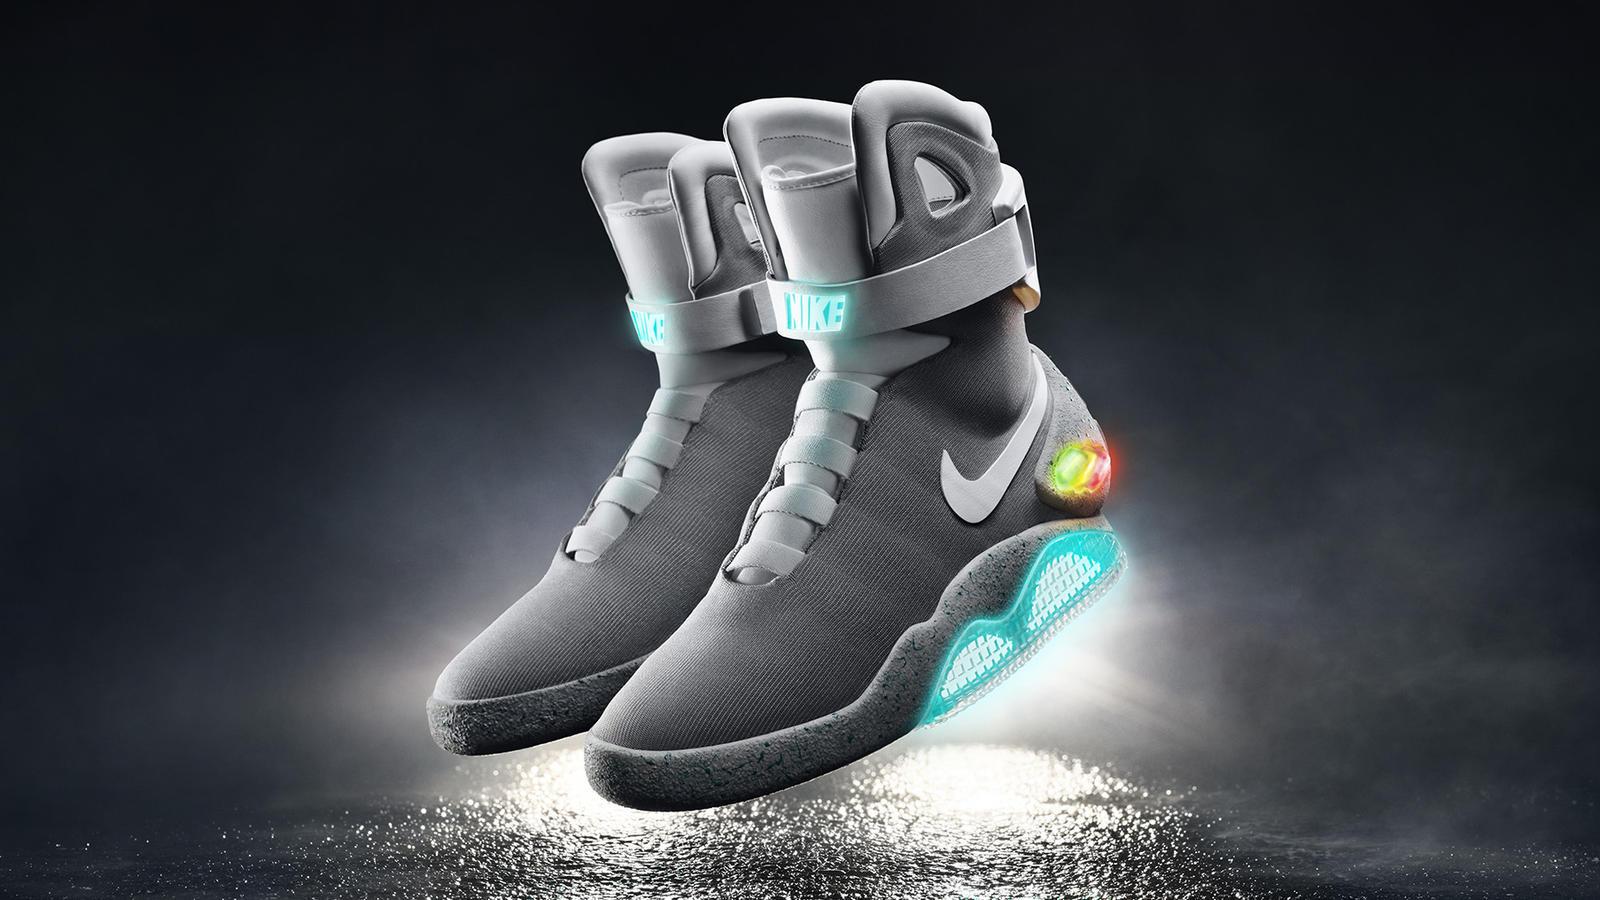 Nike will release a new samochowiec sneakers in 2019